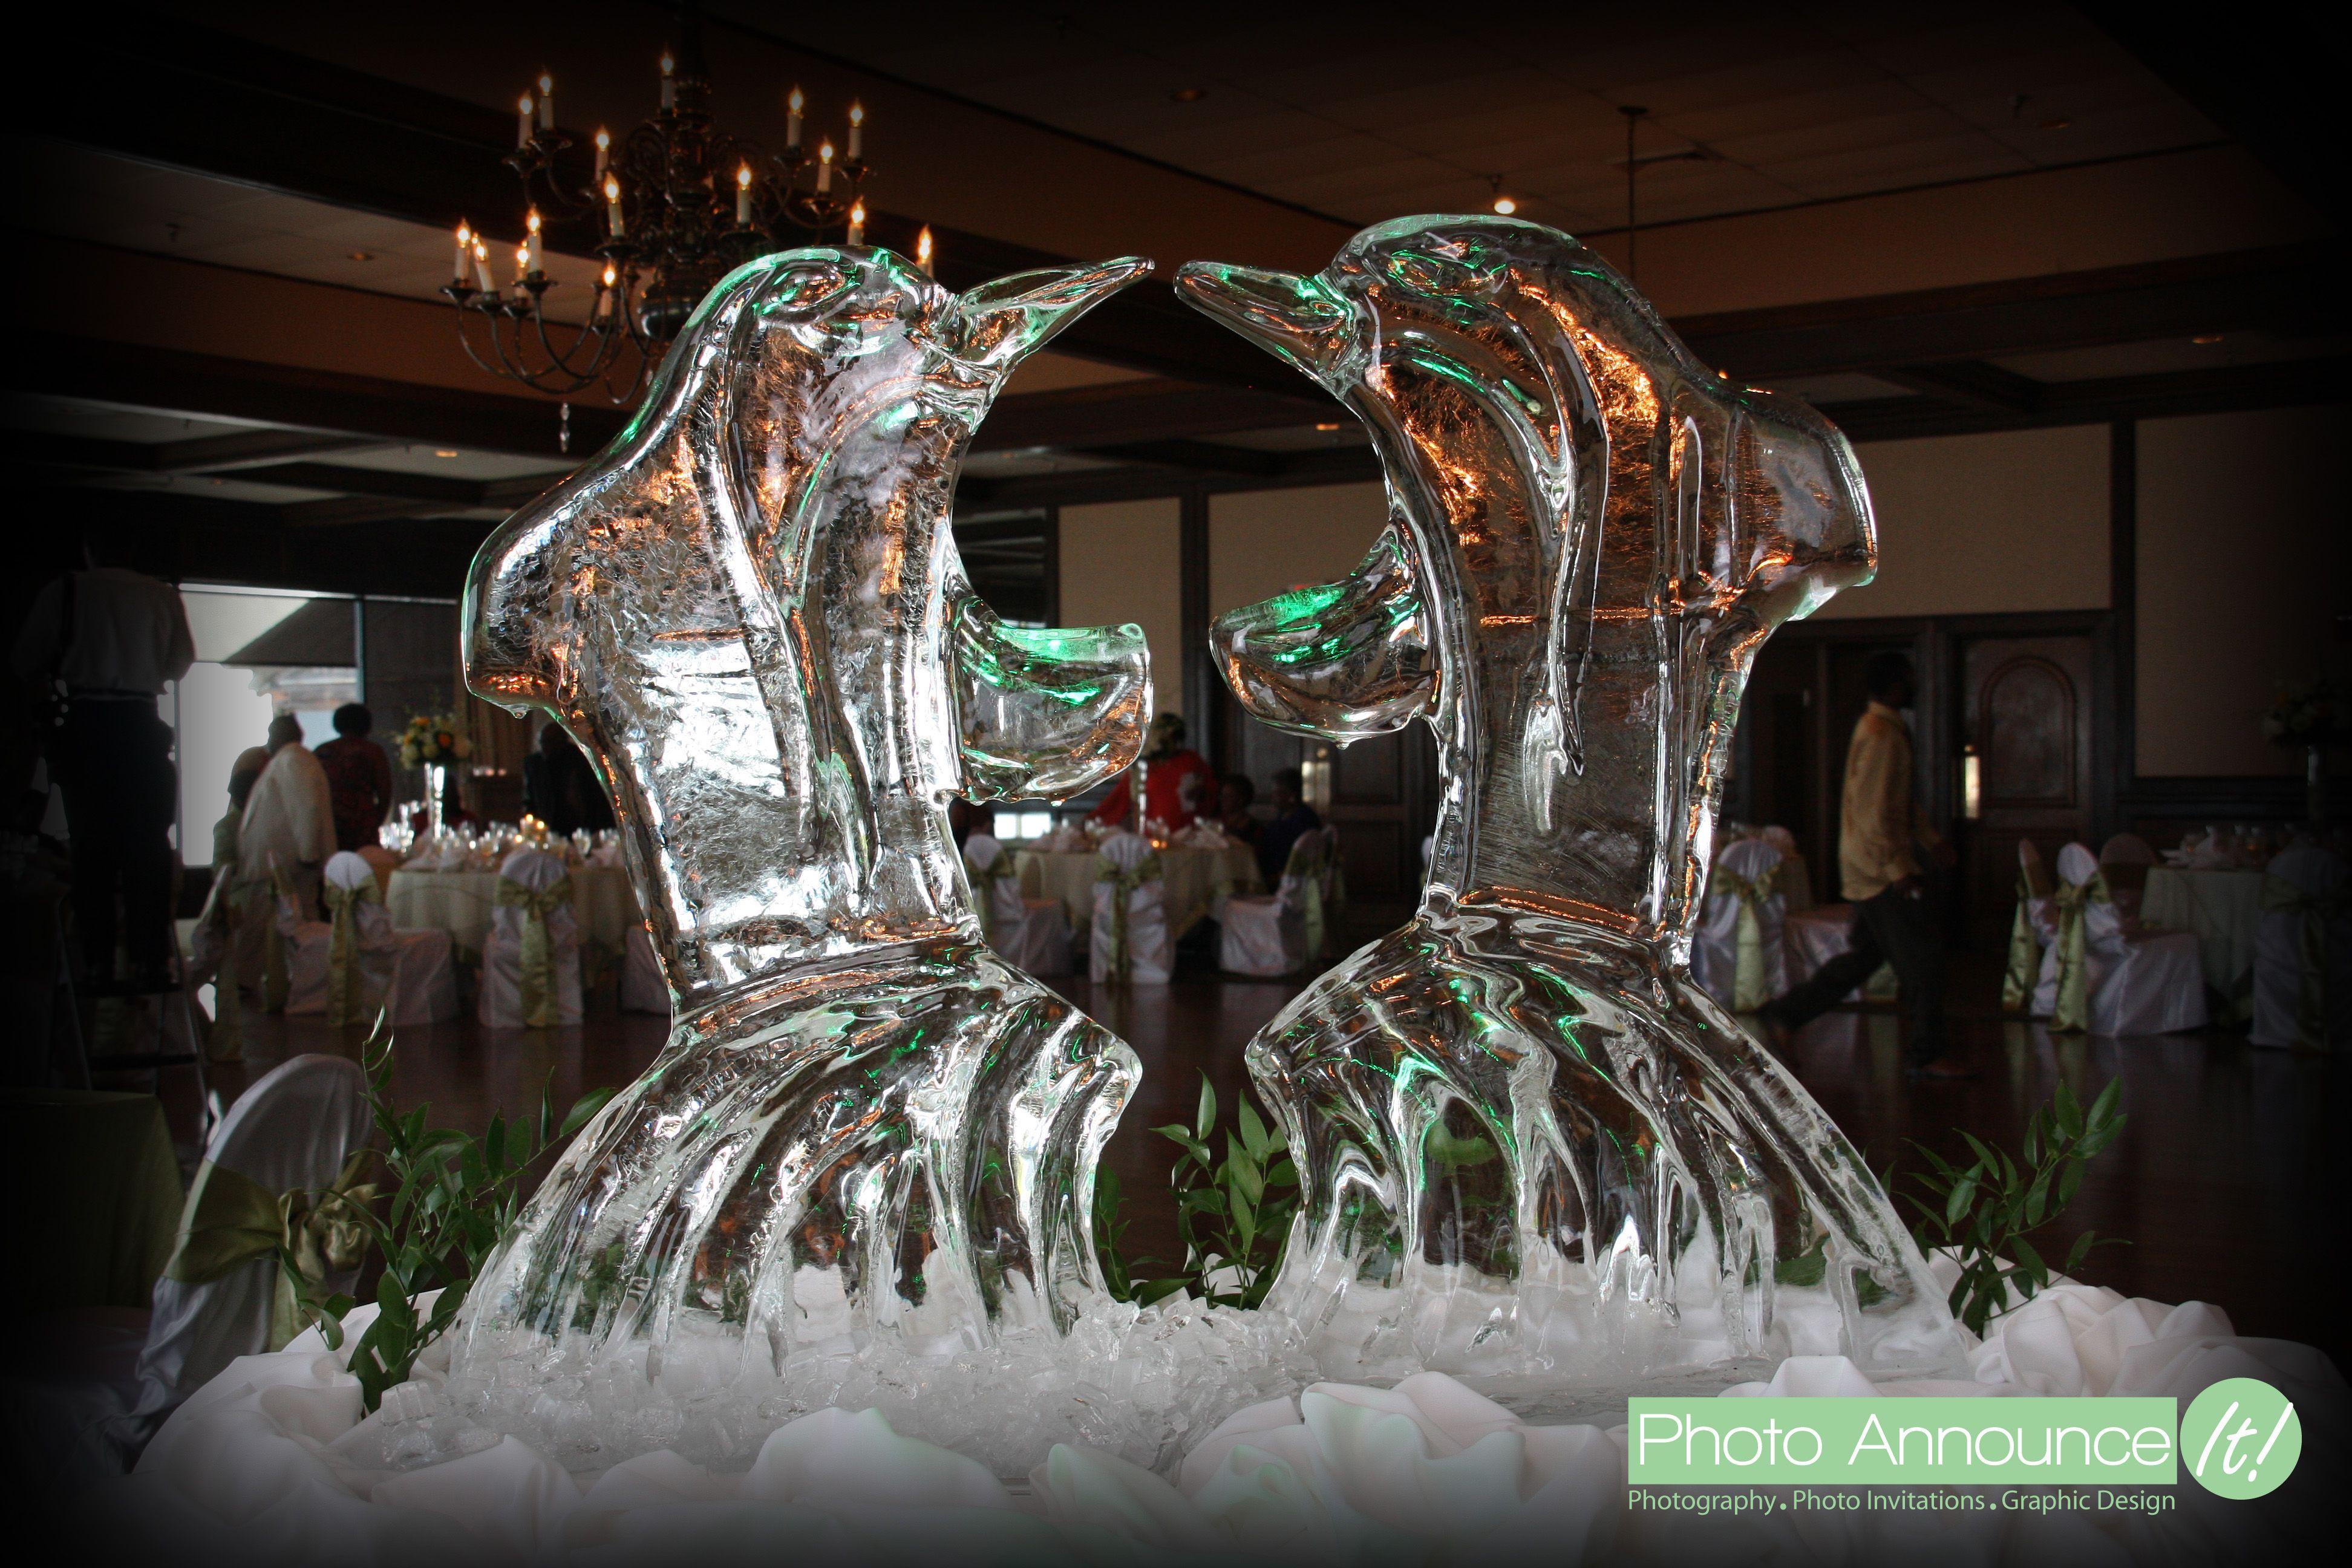 Disneyland photos disneyland paris bride groom table grooms table - Ice Sculpture Of Two Dolphins Representing The Bride And Groom